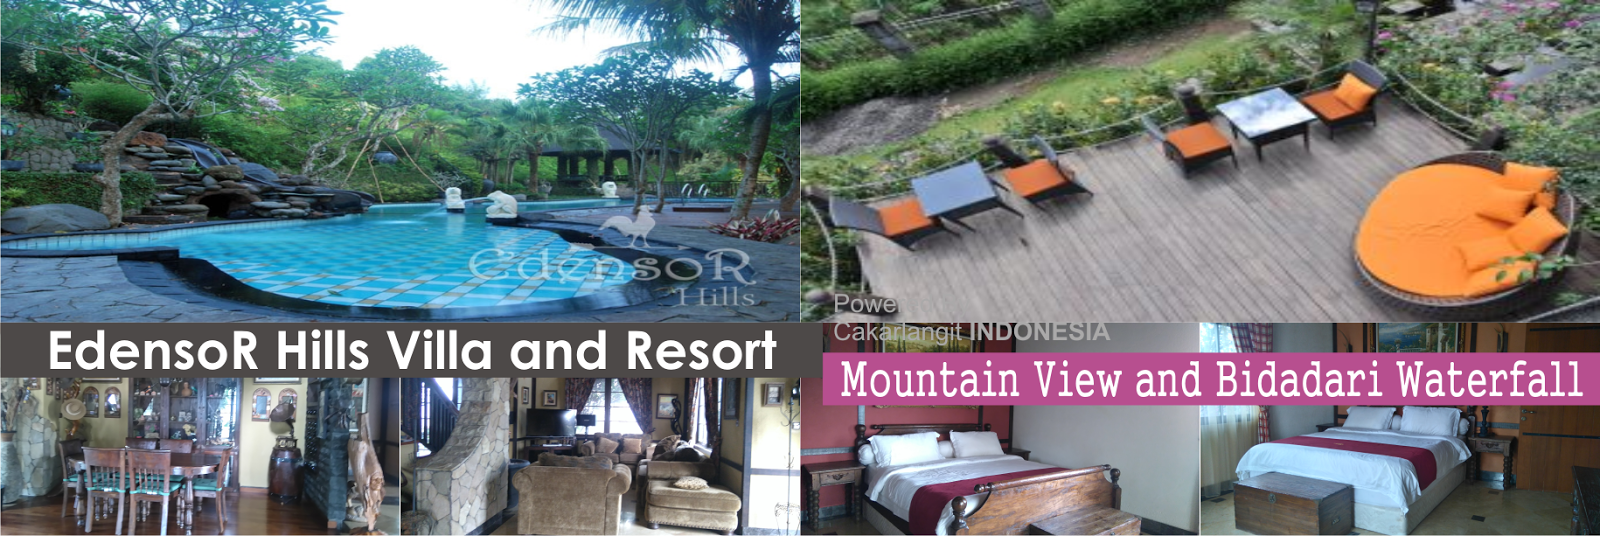 Edensor Hills Resort